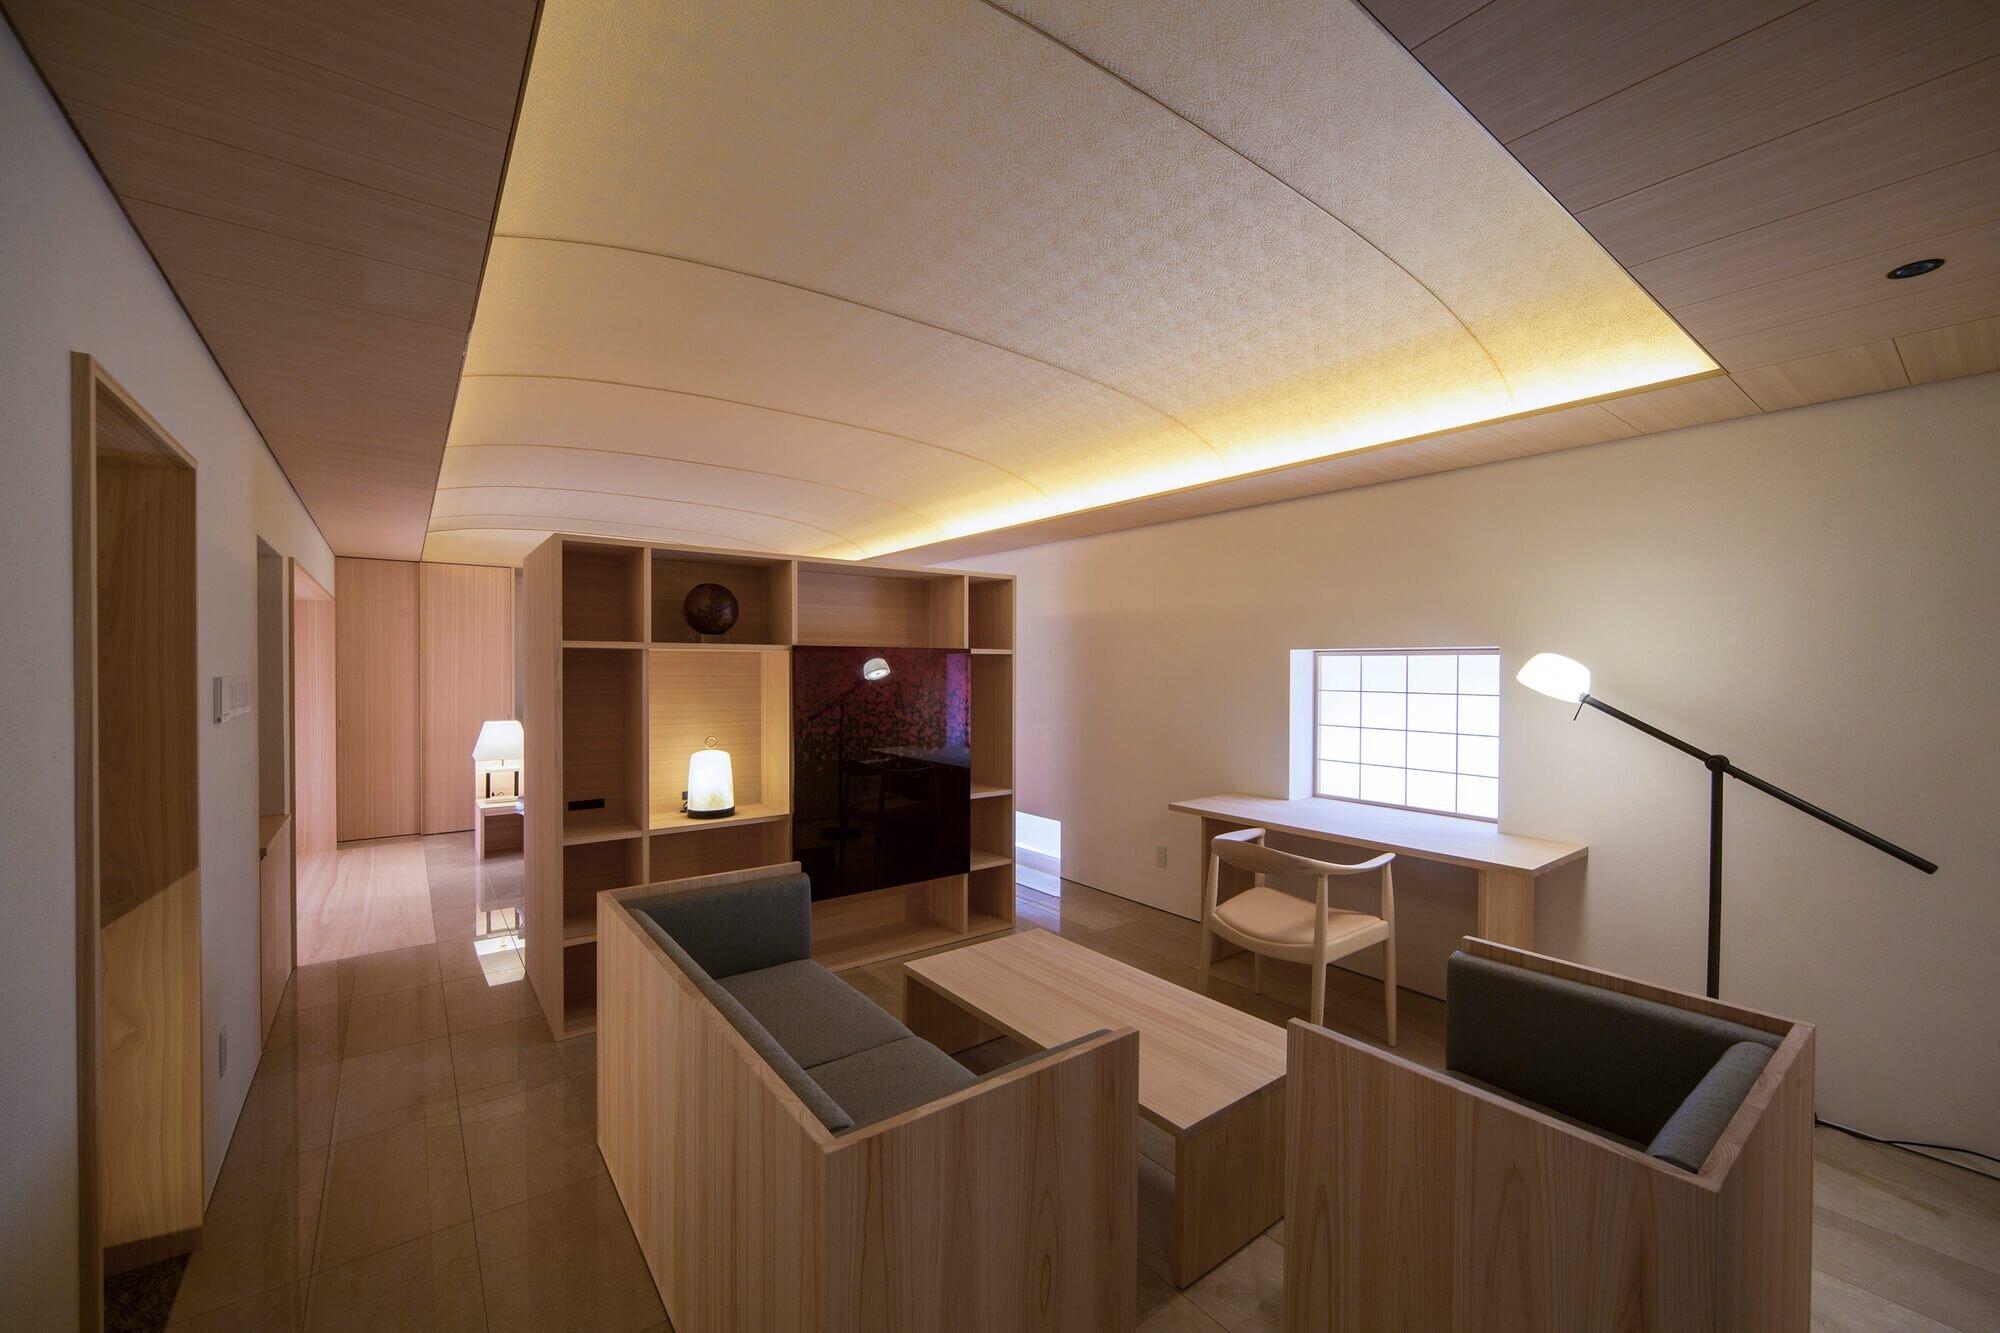 Oukikyo-Atsumasa-Tamura-Design-Office-Japan-9